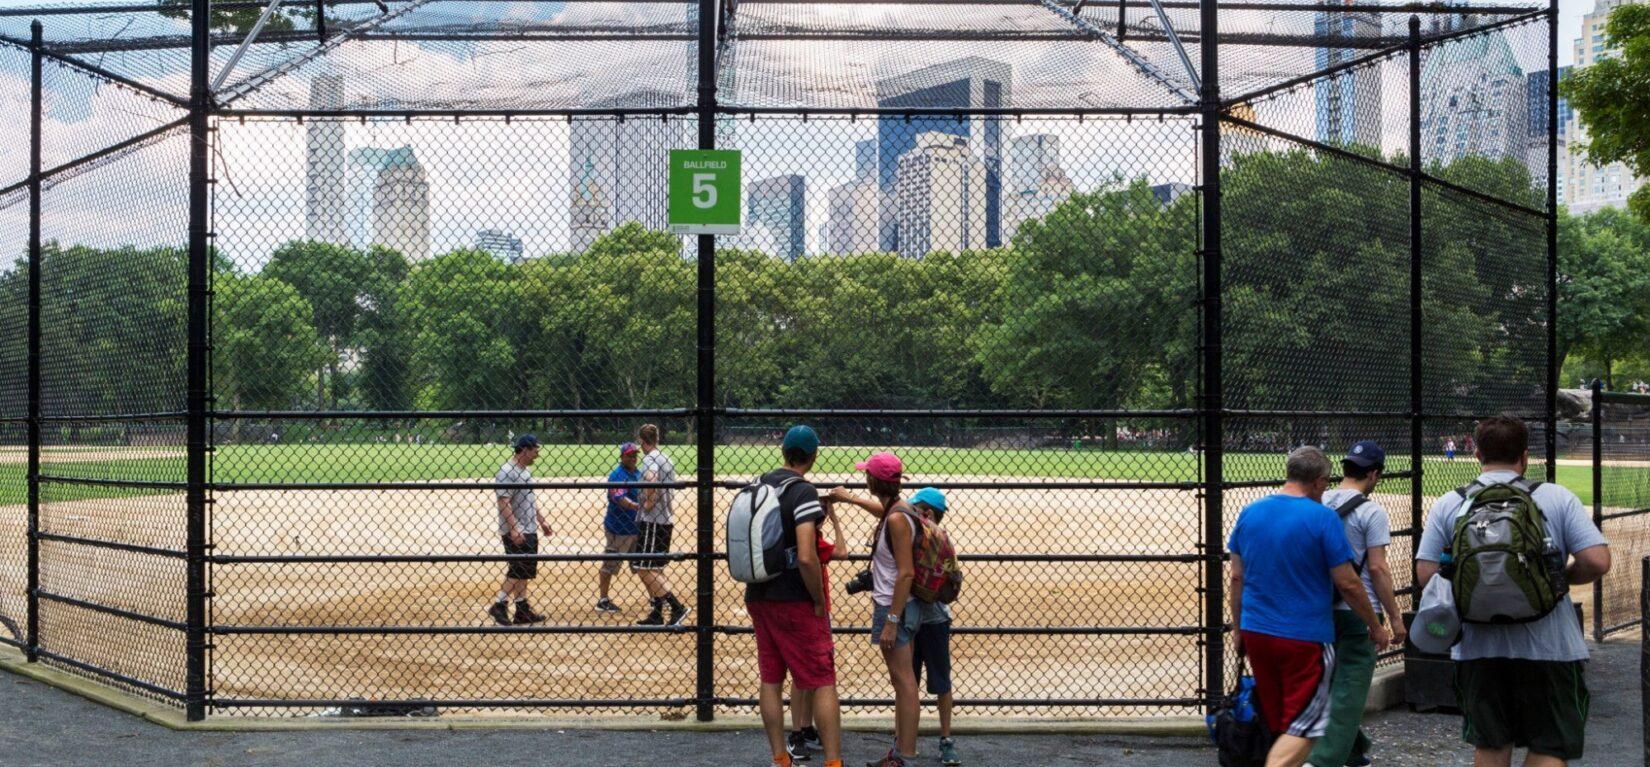 The midtown skyline seen through the chain-link backstop of ballfield #5